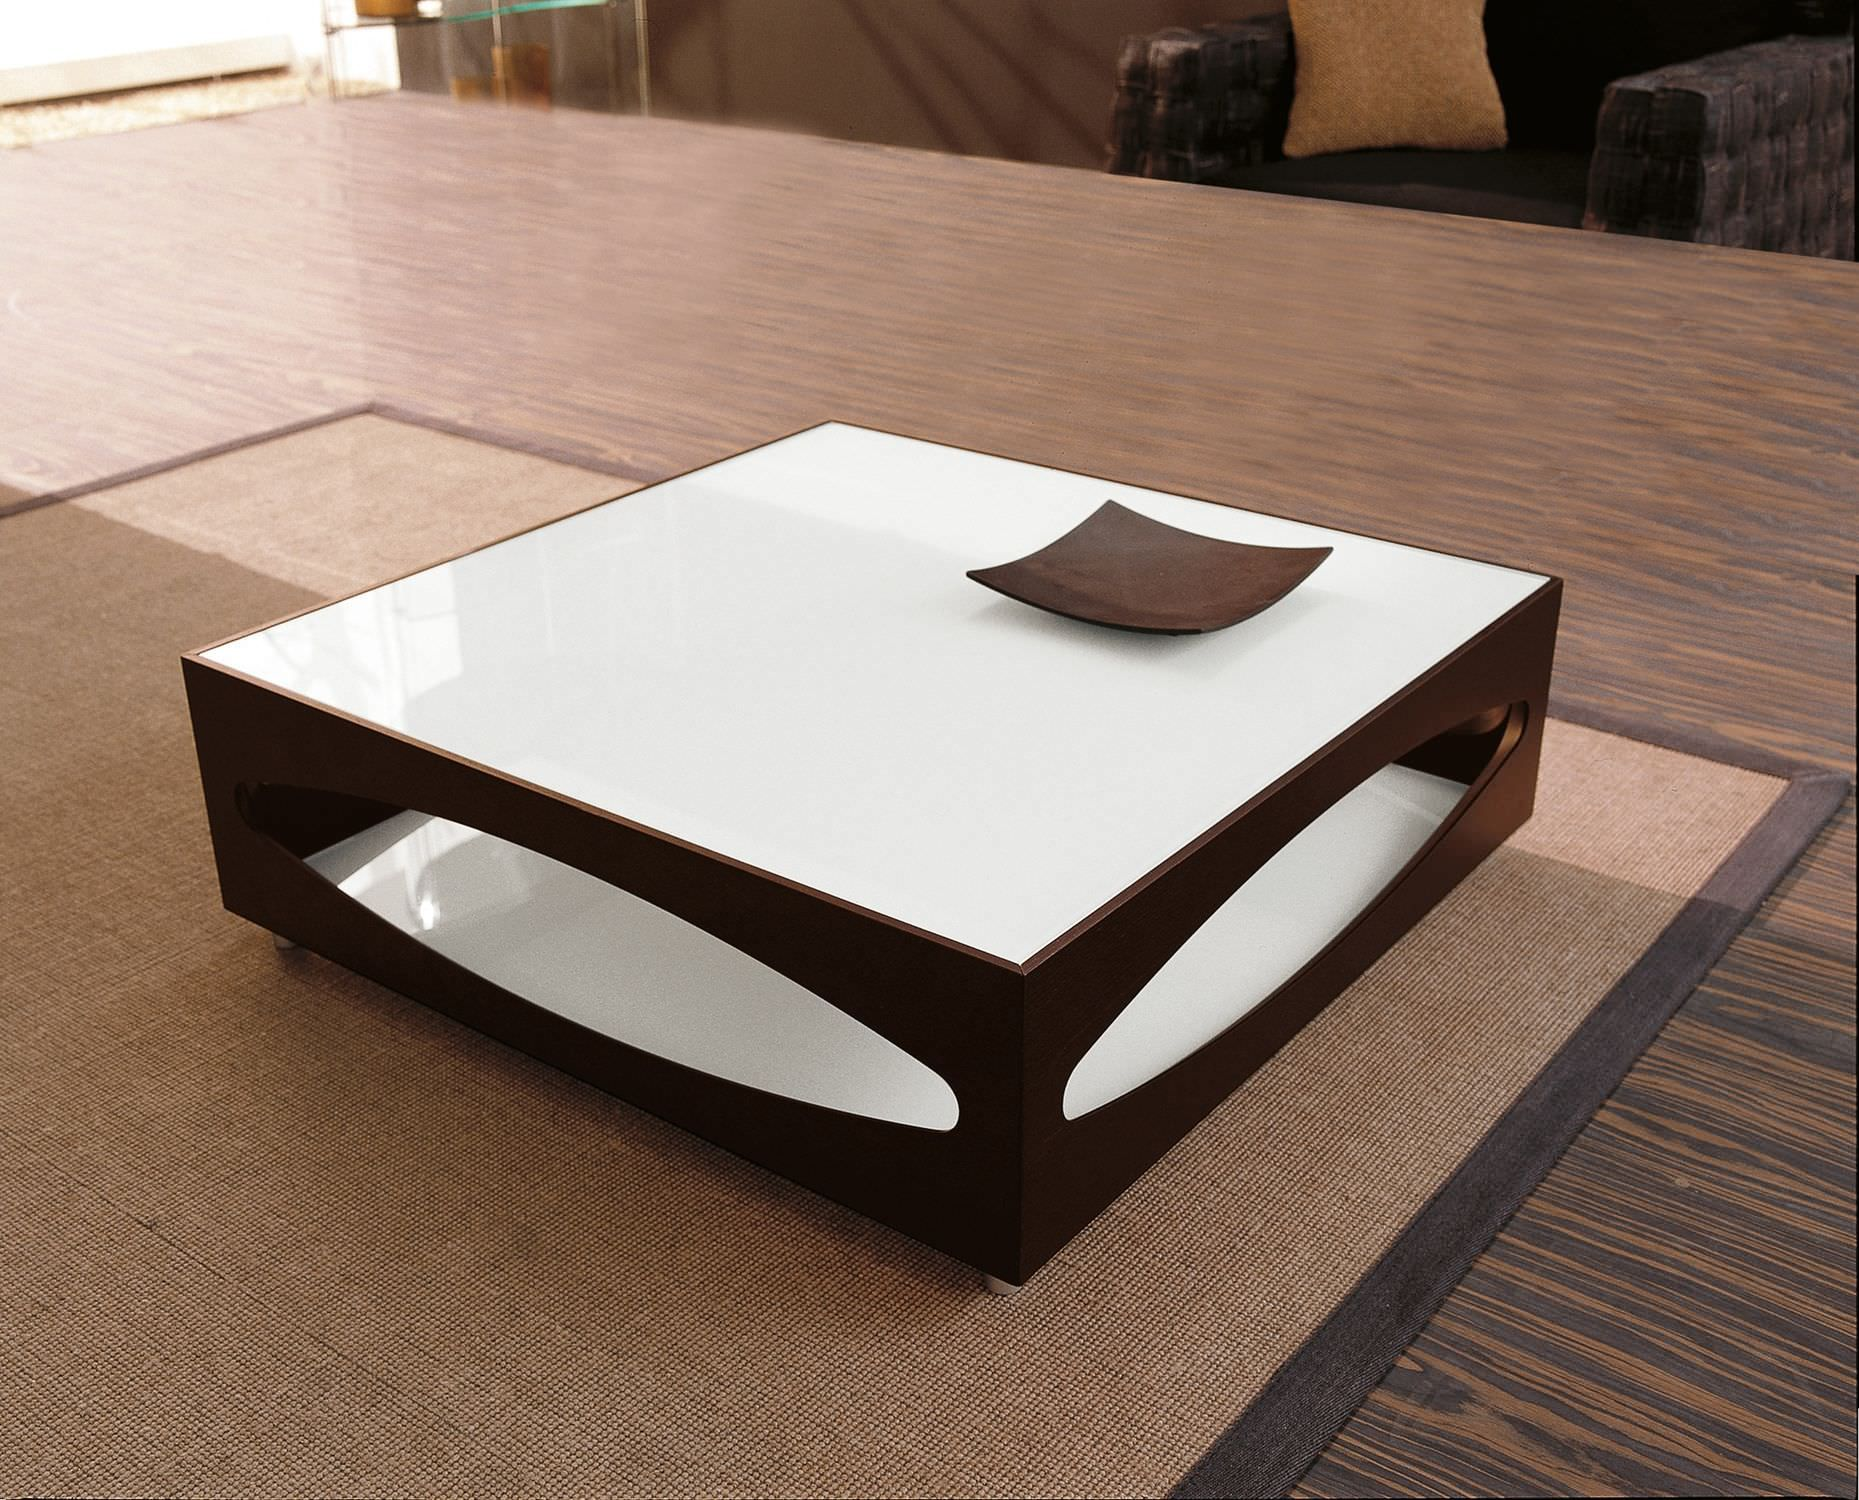 Seba Dark Brown Square Coffee Table Furniture Coffee Table Teak Coffee Table [ 2362 x 1772 Pixel ]